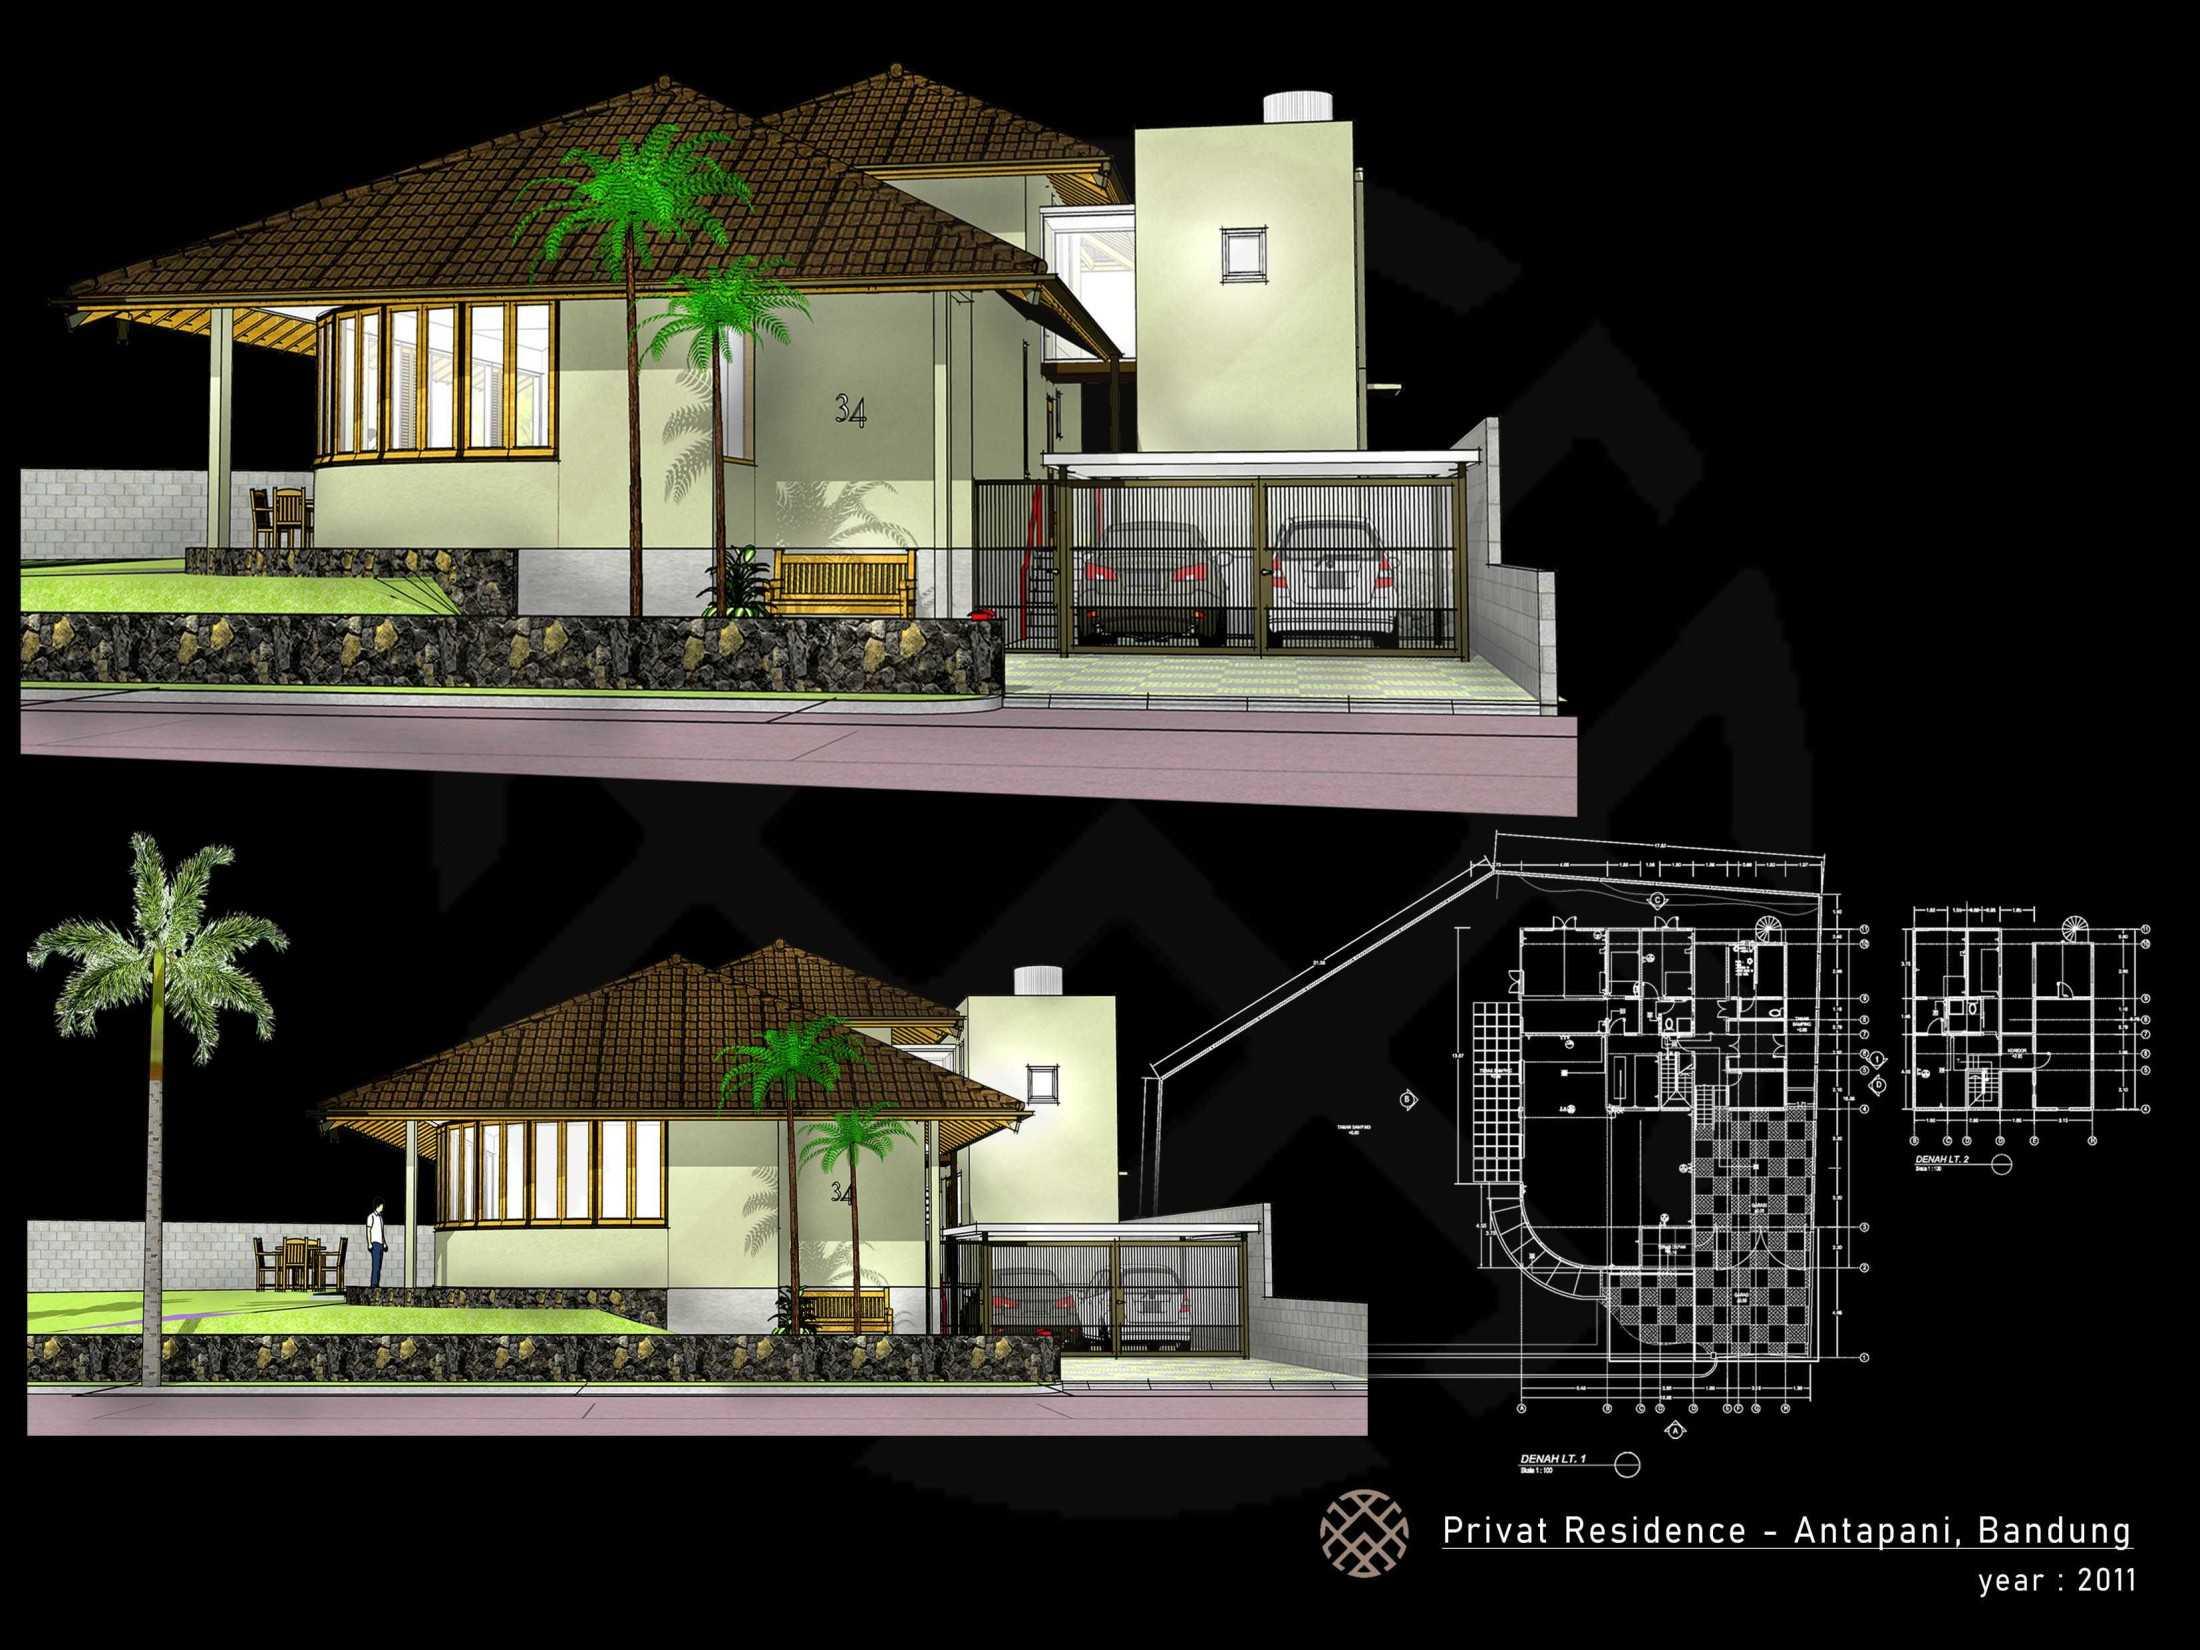 Jasa Design and Build Acleo Design di Bandung